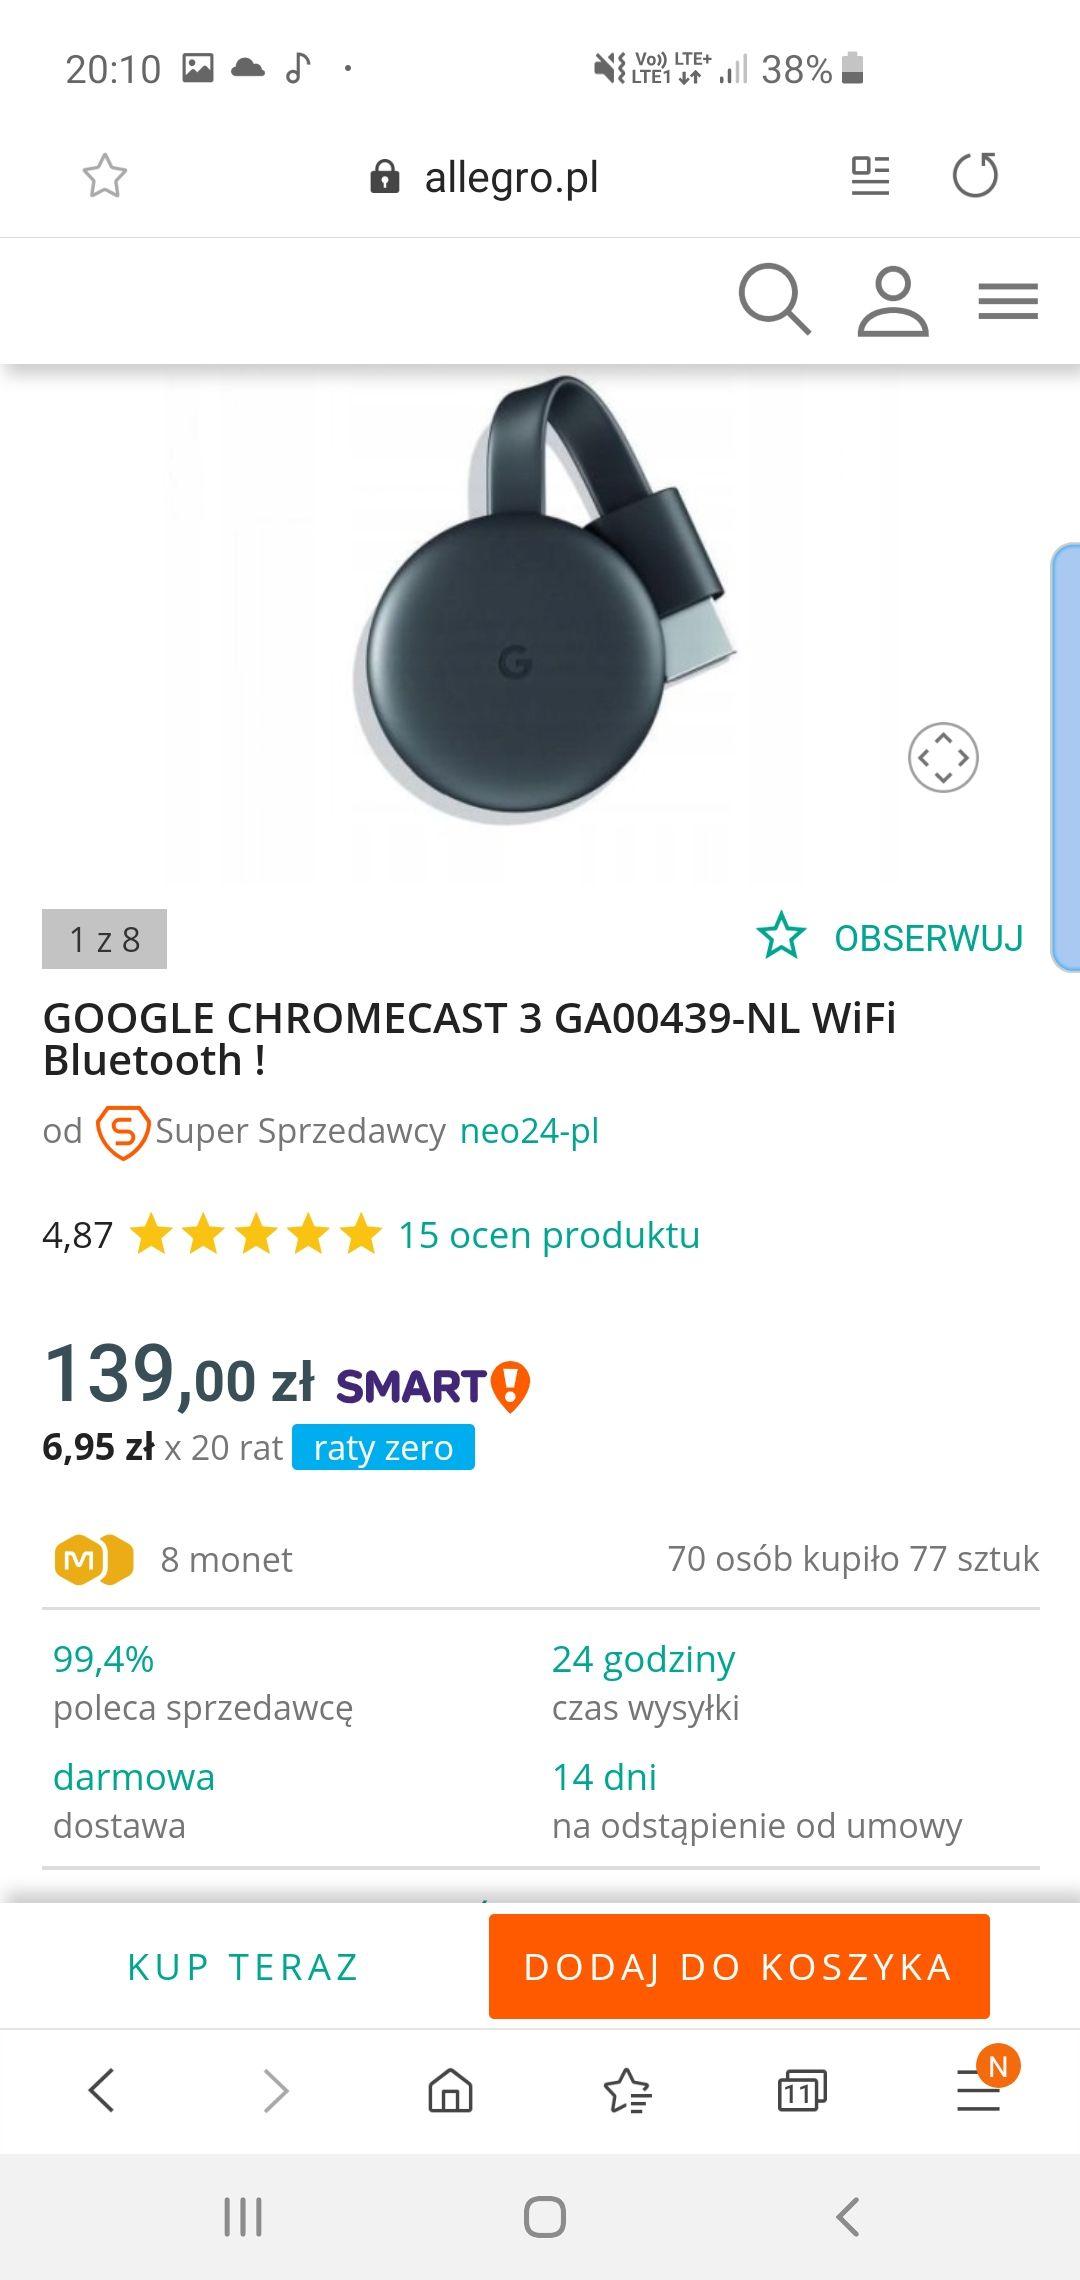 Google chromecast 3.0 GA00439-NL